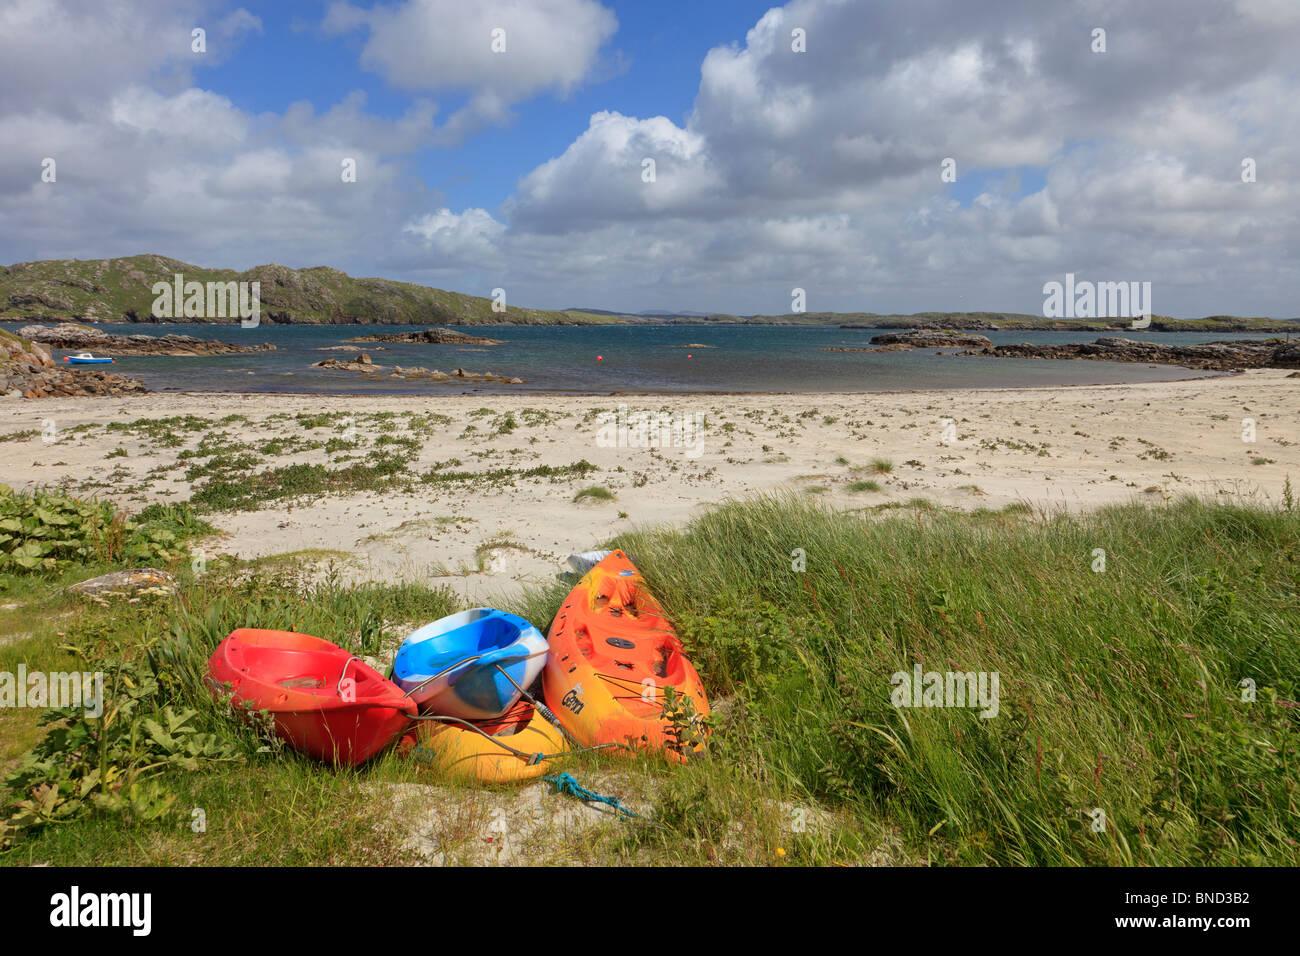 Valtos beach, Isle of Lewis, Outer Hebrides, Scotland - Stock Image